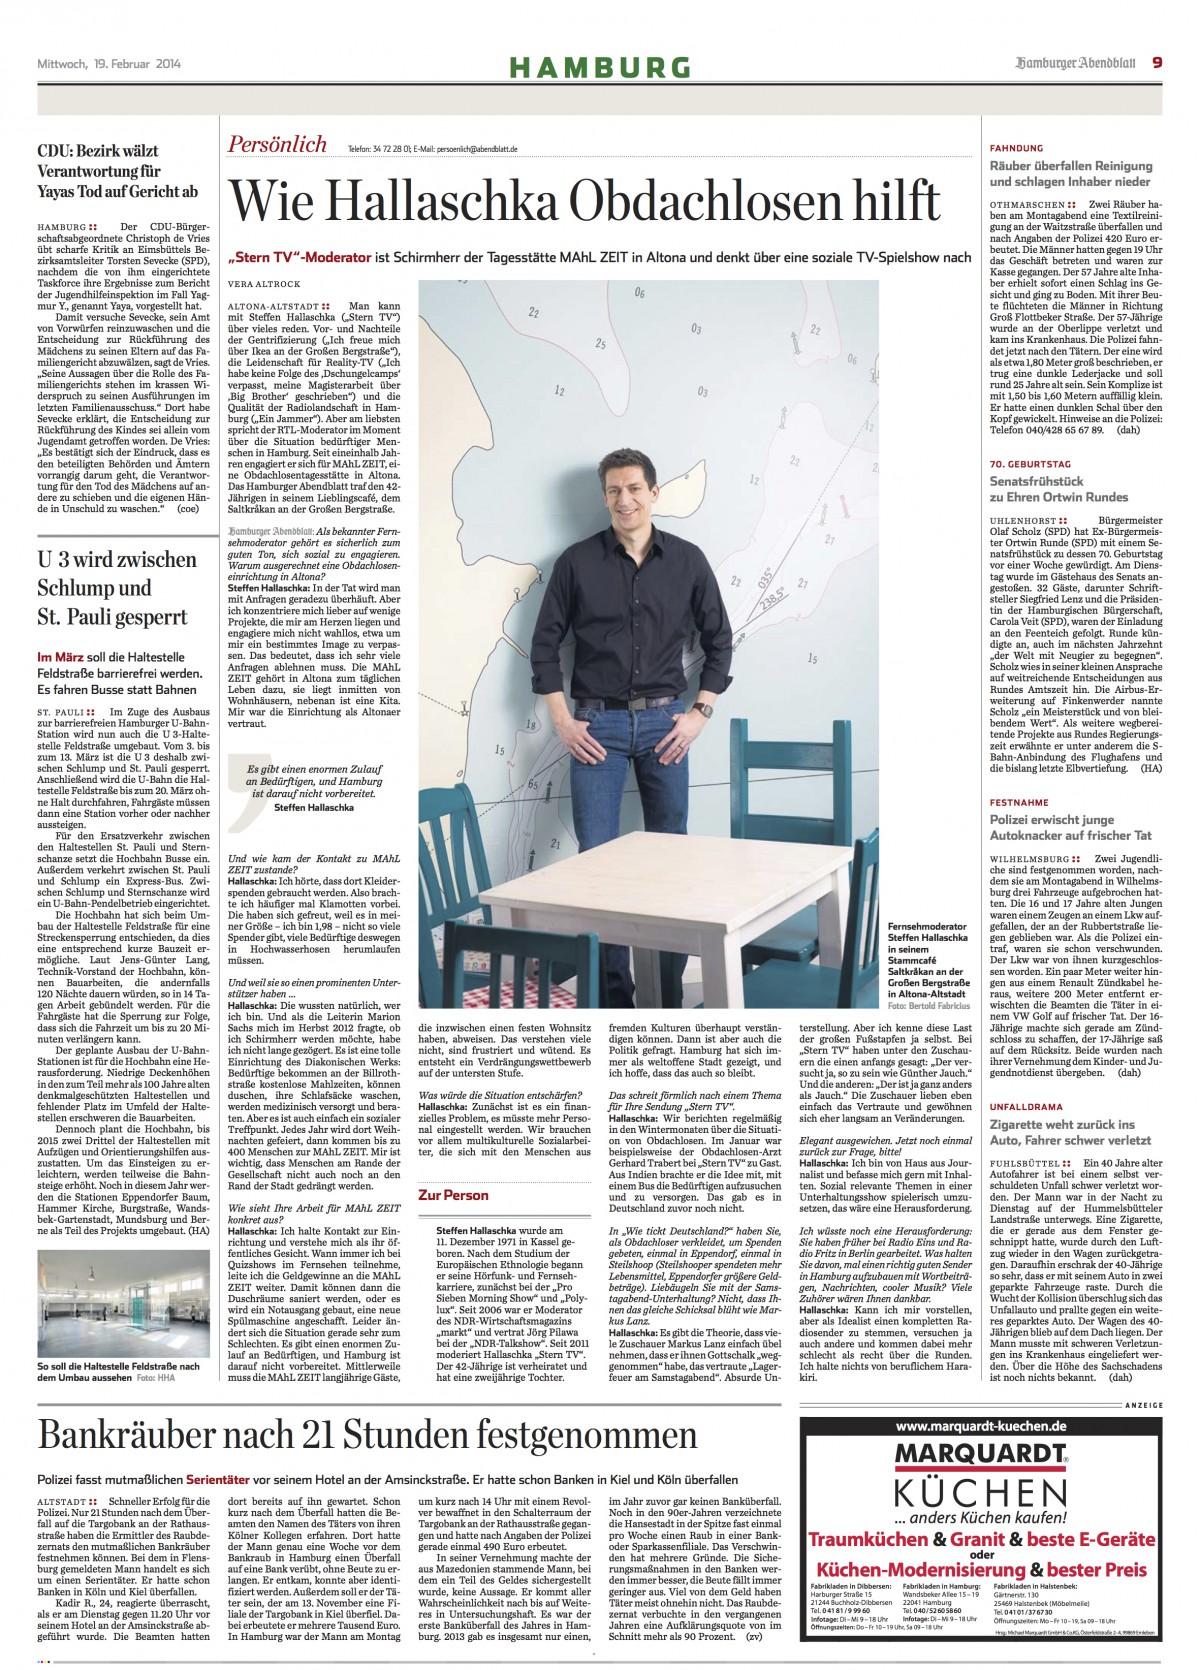 Hamburger Abendblatt 19.2.2014 Steffen Hallaschka